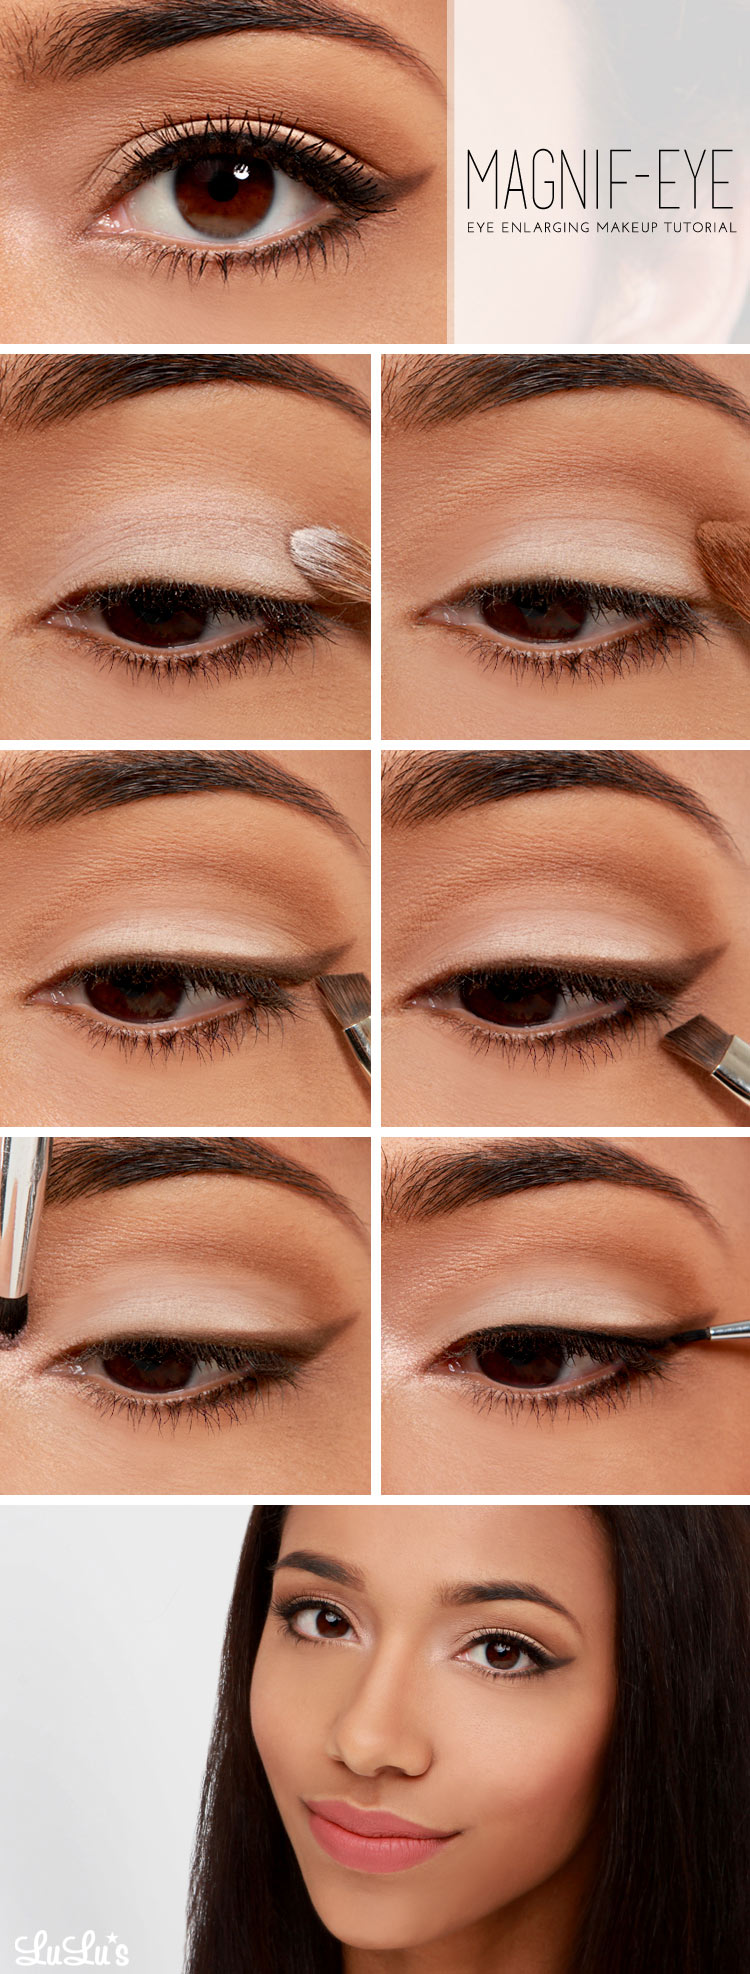 eye-enlarging-makeup-